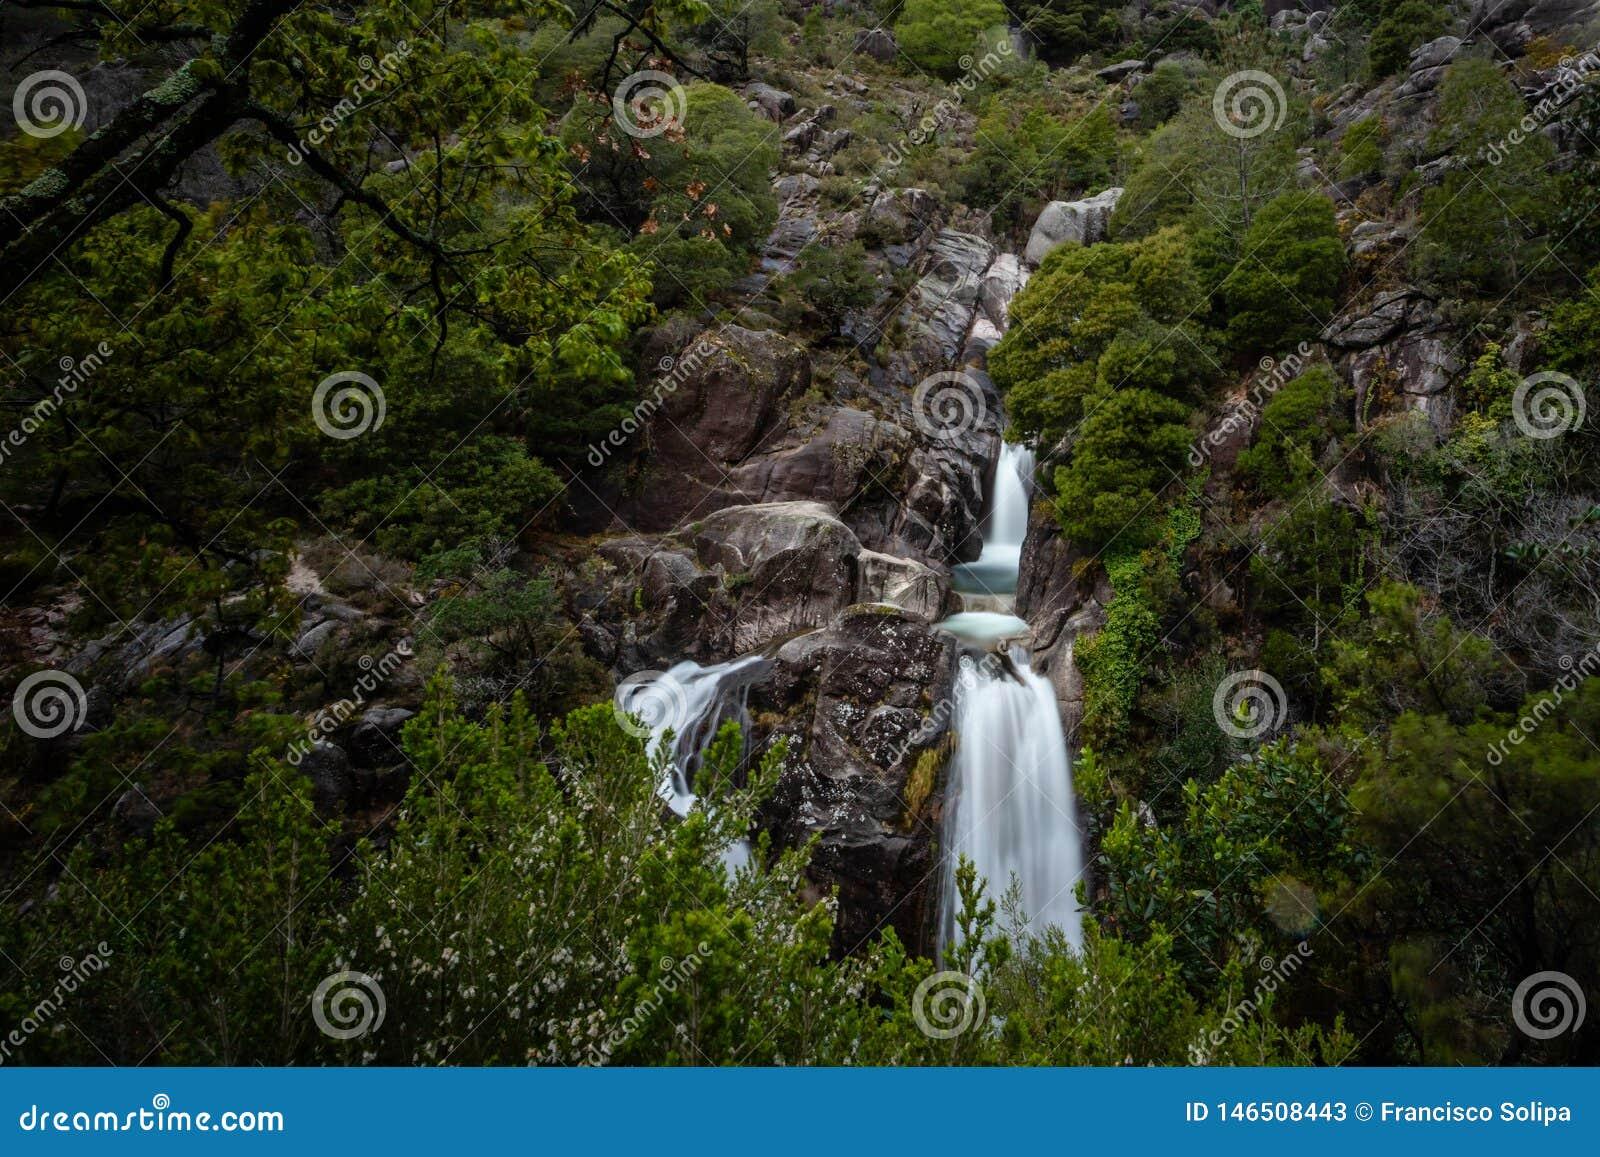 View of waterfall of Arado on Peneda Geres National Park, Portugal